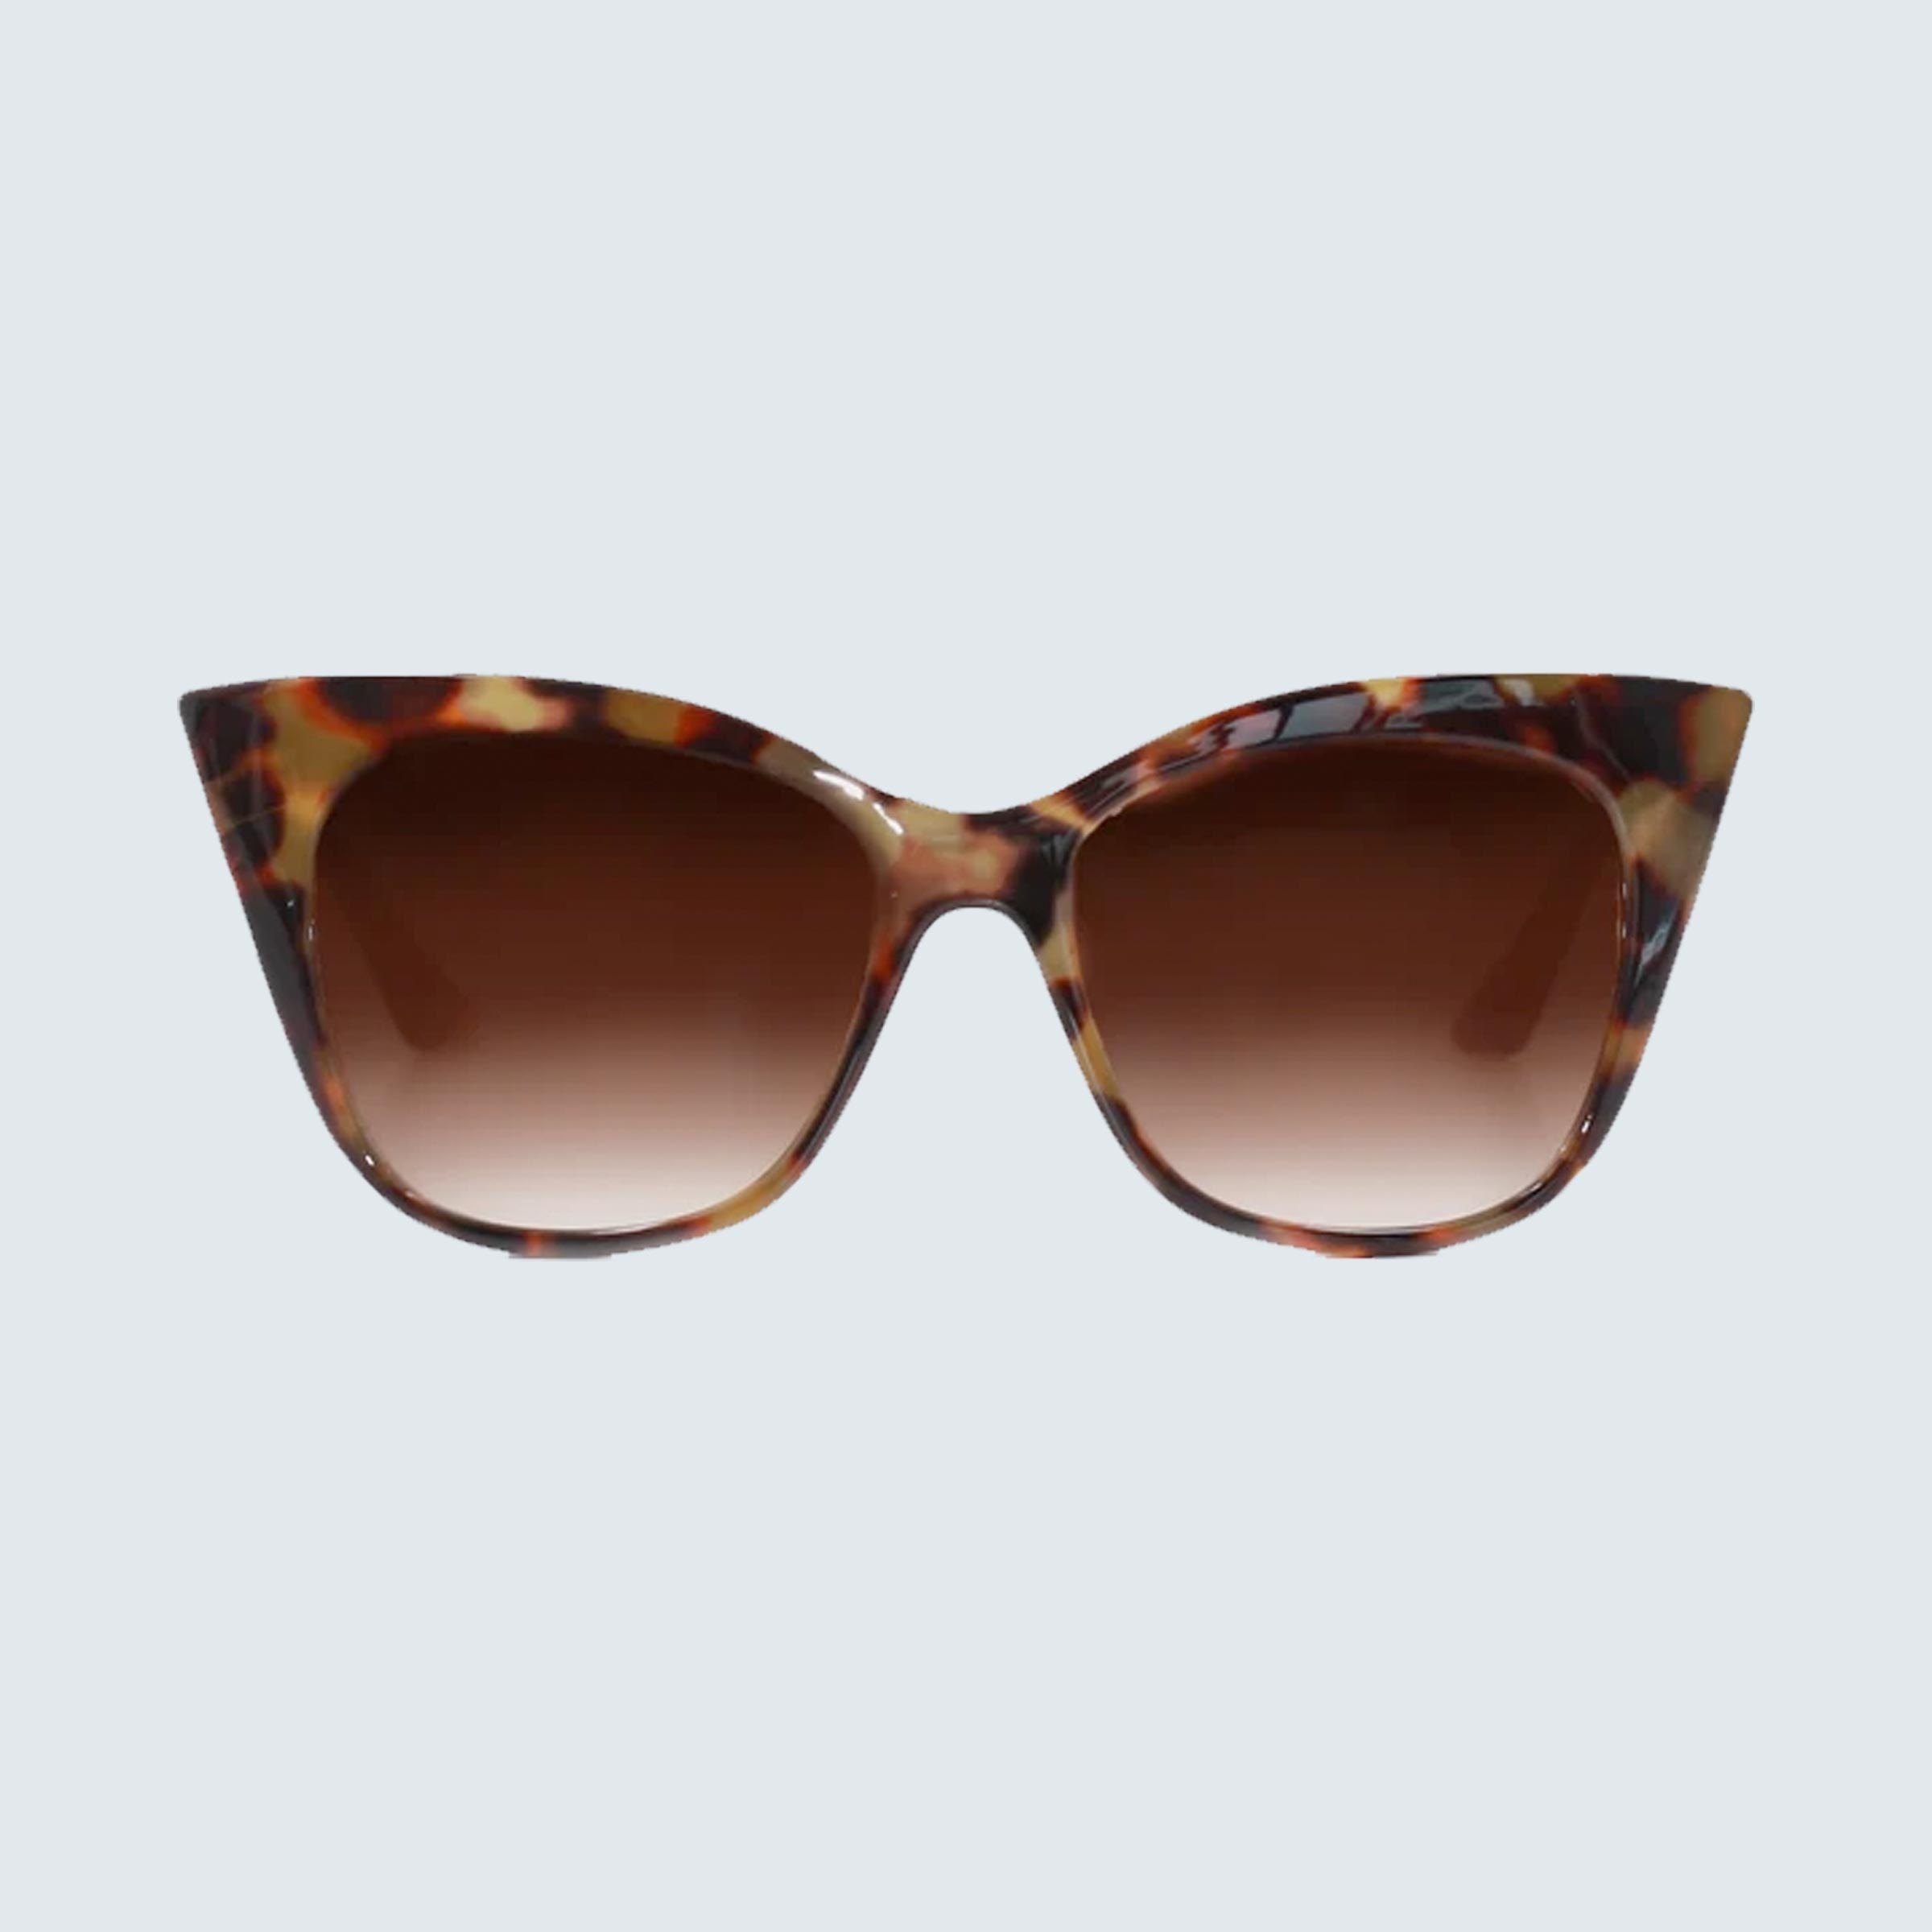 Topfoxx Venice Cateye Sunglasses